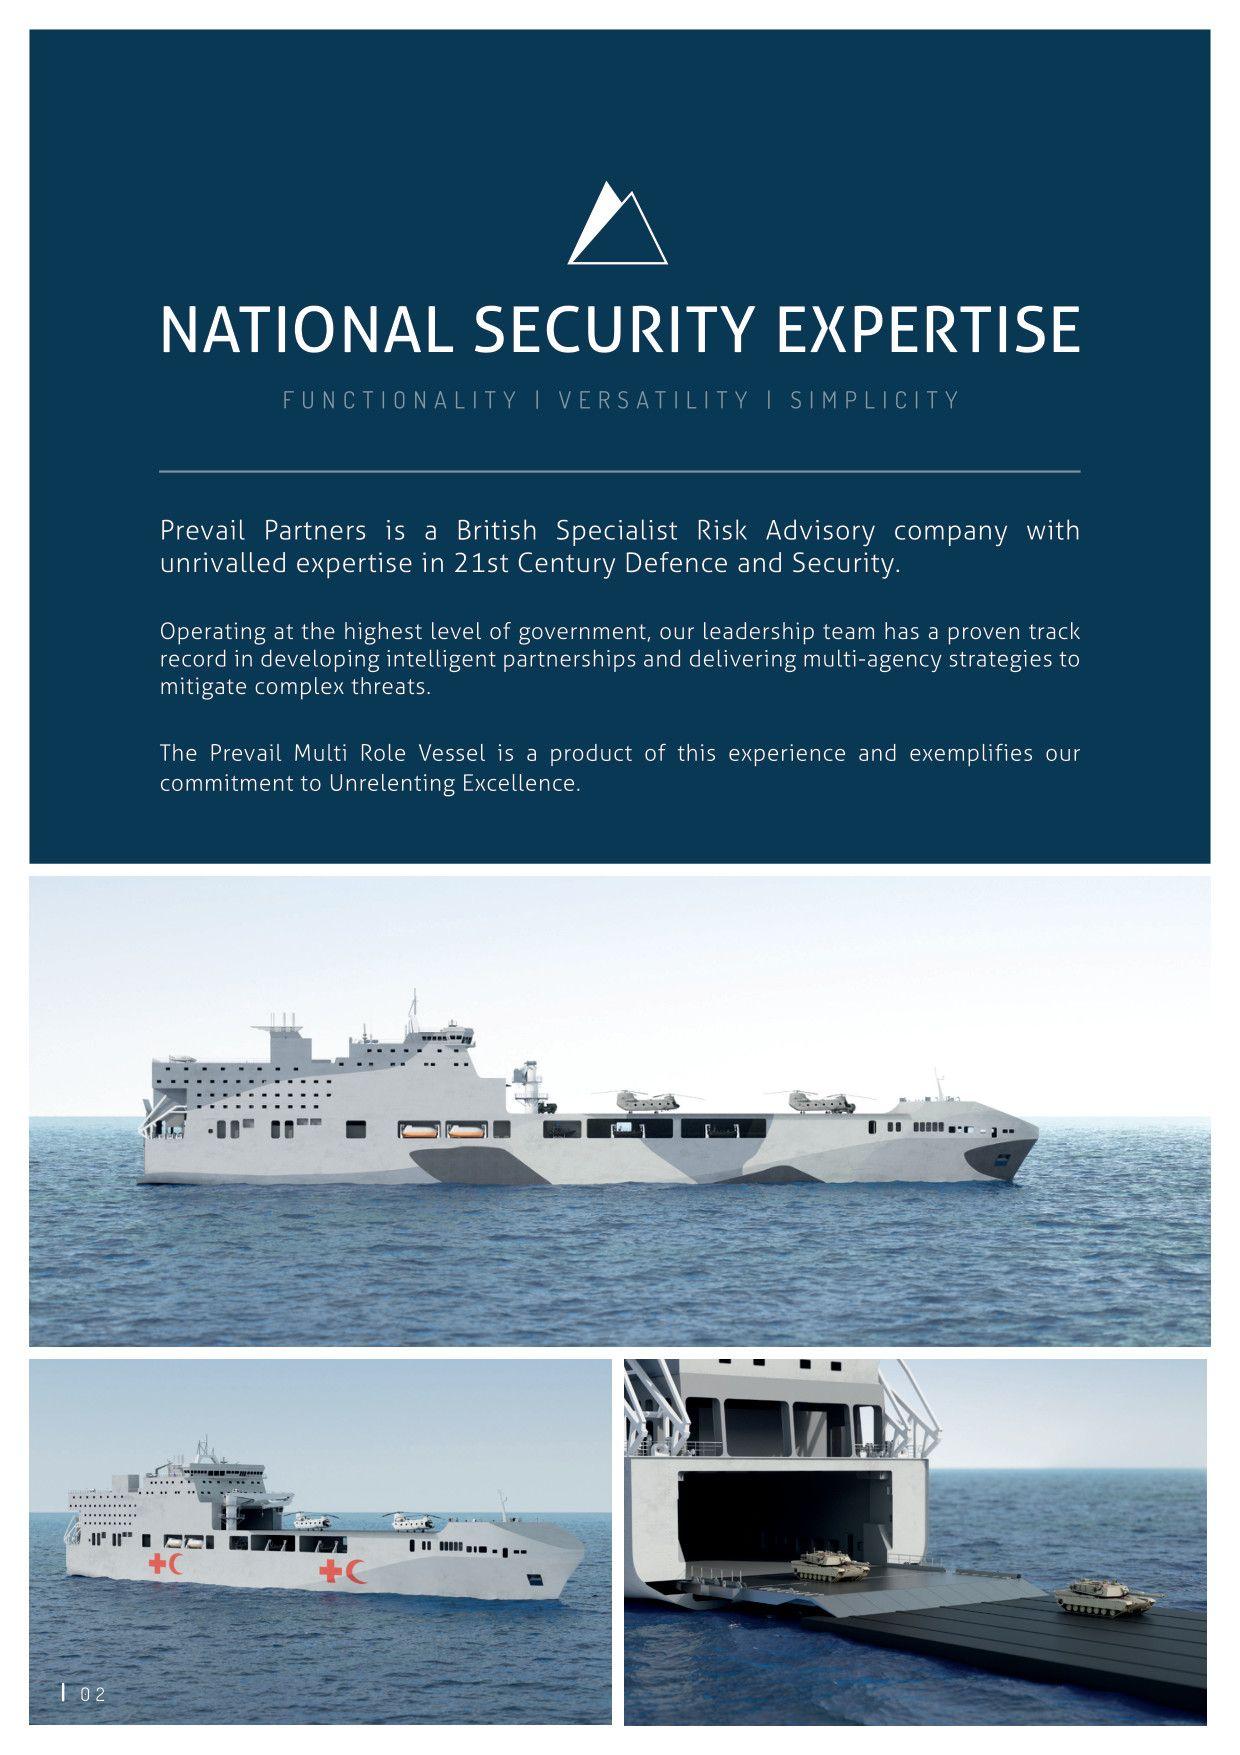 Prevail Multi Role Vessel Us Navy Ships Royal Navy Navy Ships